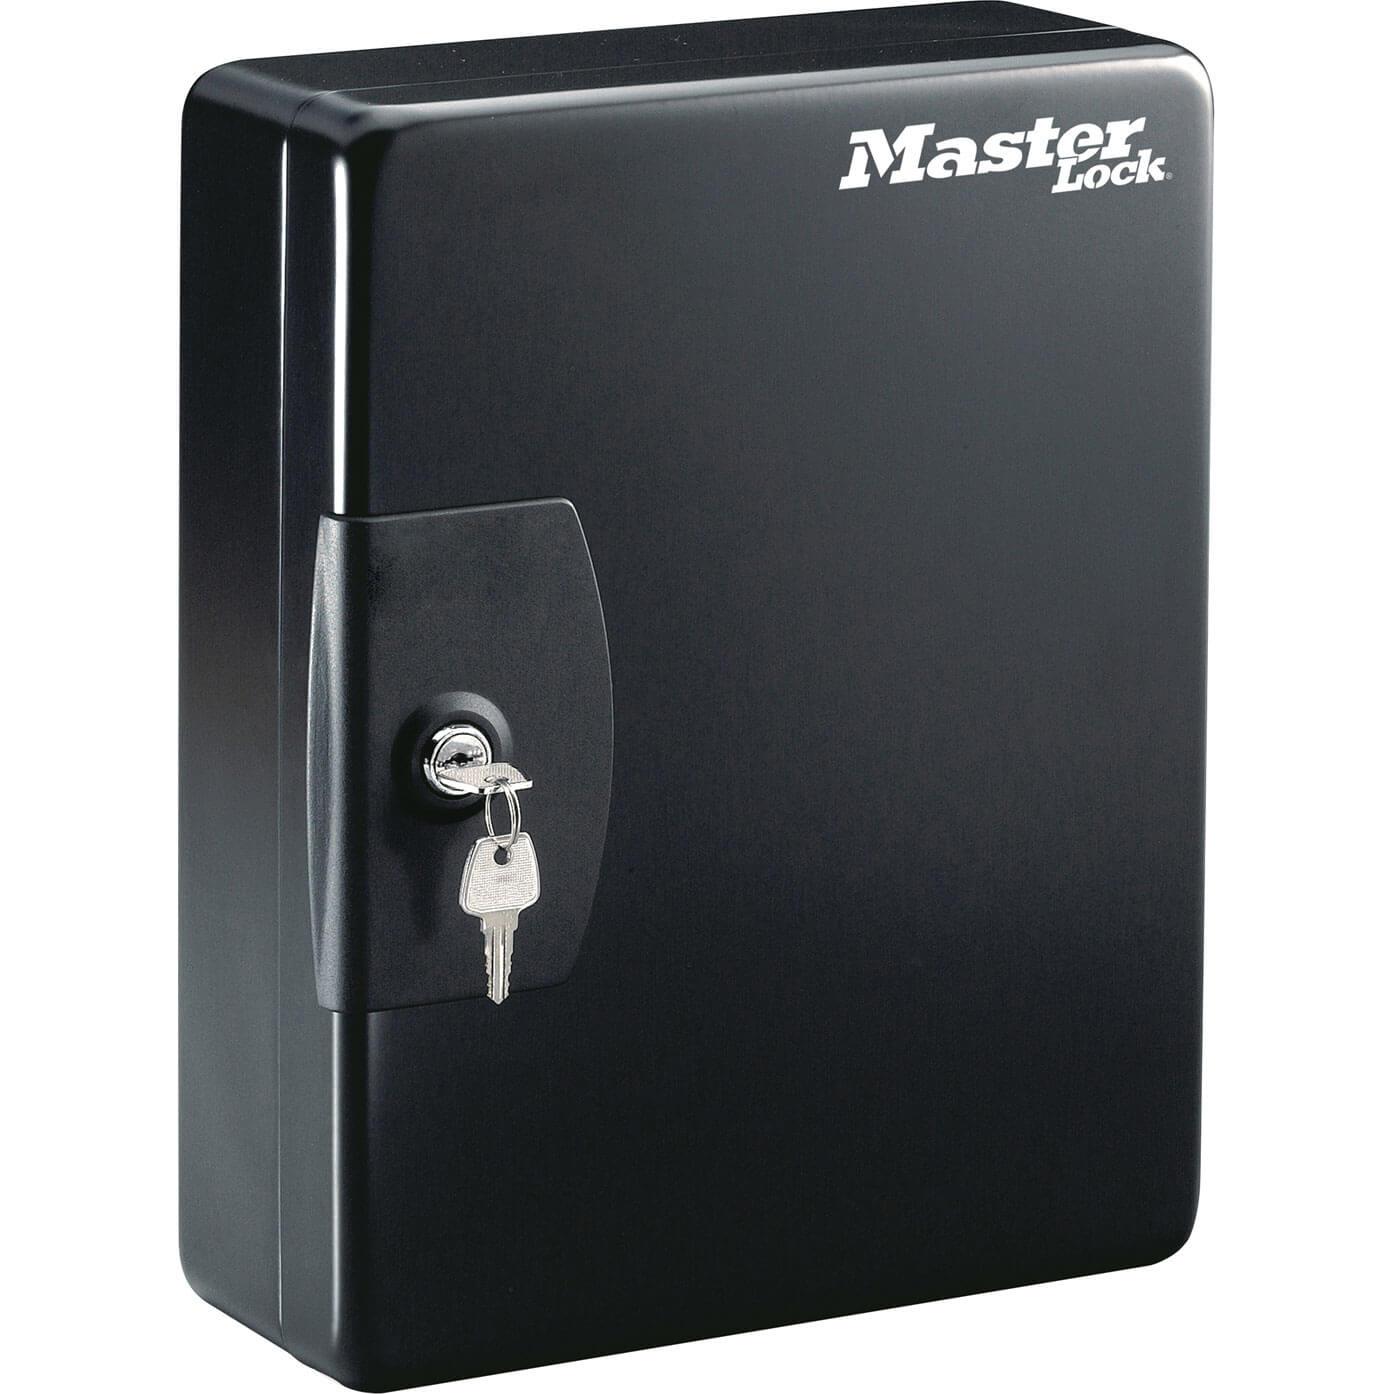 Image of Master 25 hook Lock Key Storage Lock Box